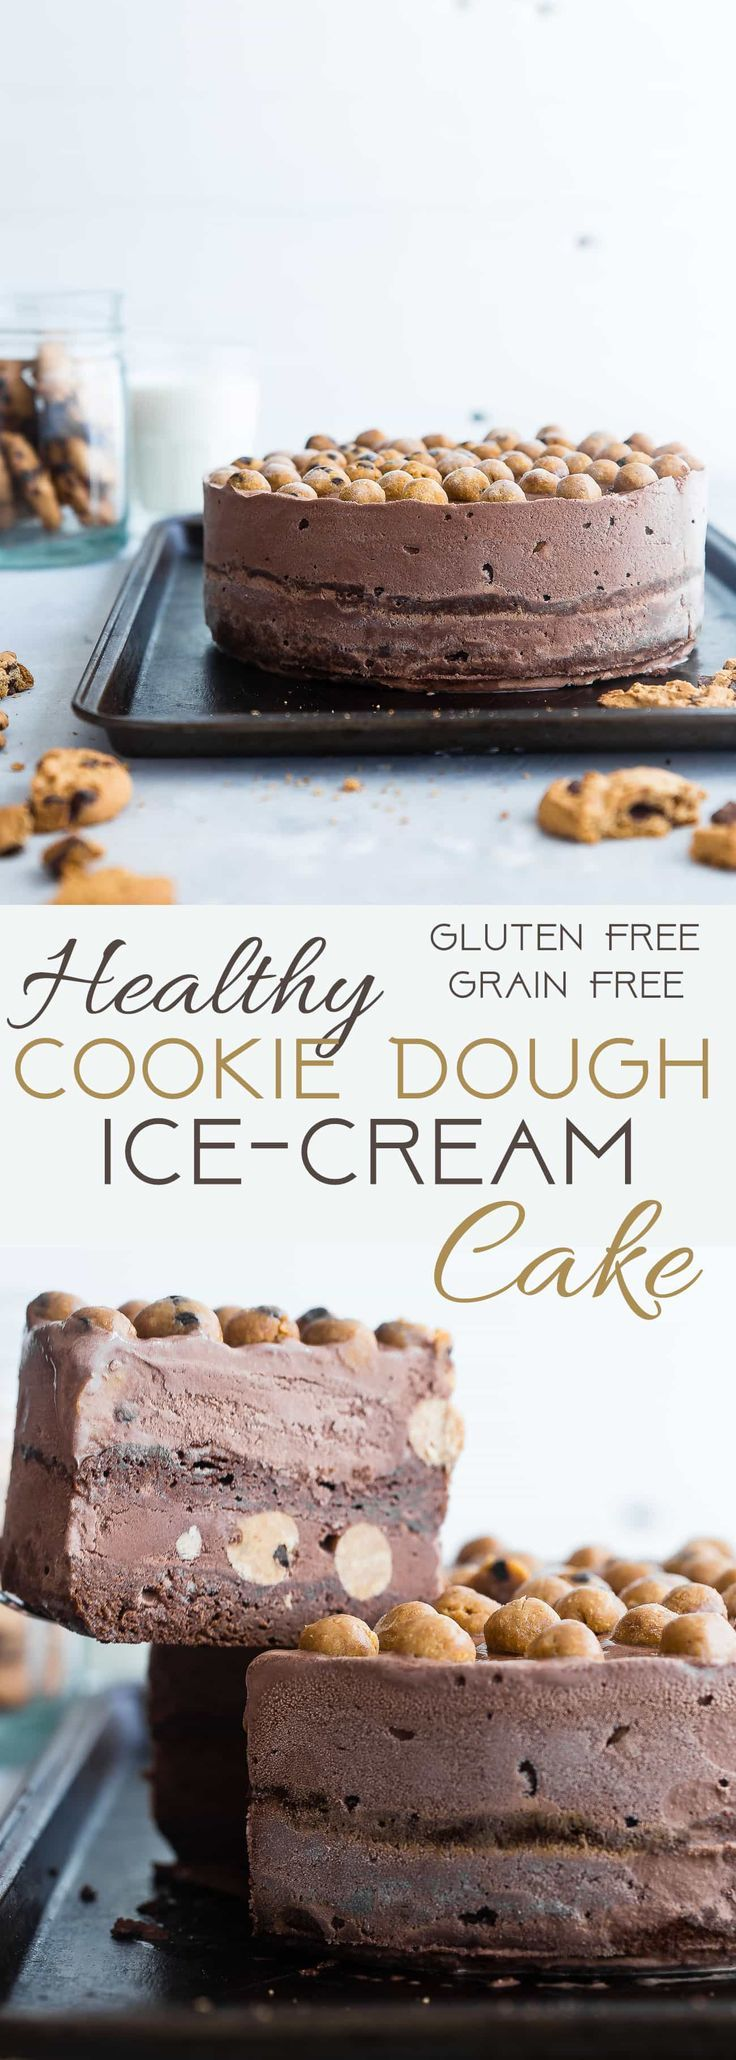 Healthy Cookie Dough Ice Cream Cake -This easy homemade ice cream cake uses healthy chocolate ice cream and bites of chickpea cookie dough for a grain and gluten free, lighter dessert that everyone will love! | Foodfaithfitness.com | @FoodFaithFit via @FoodFaithFit